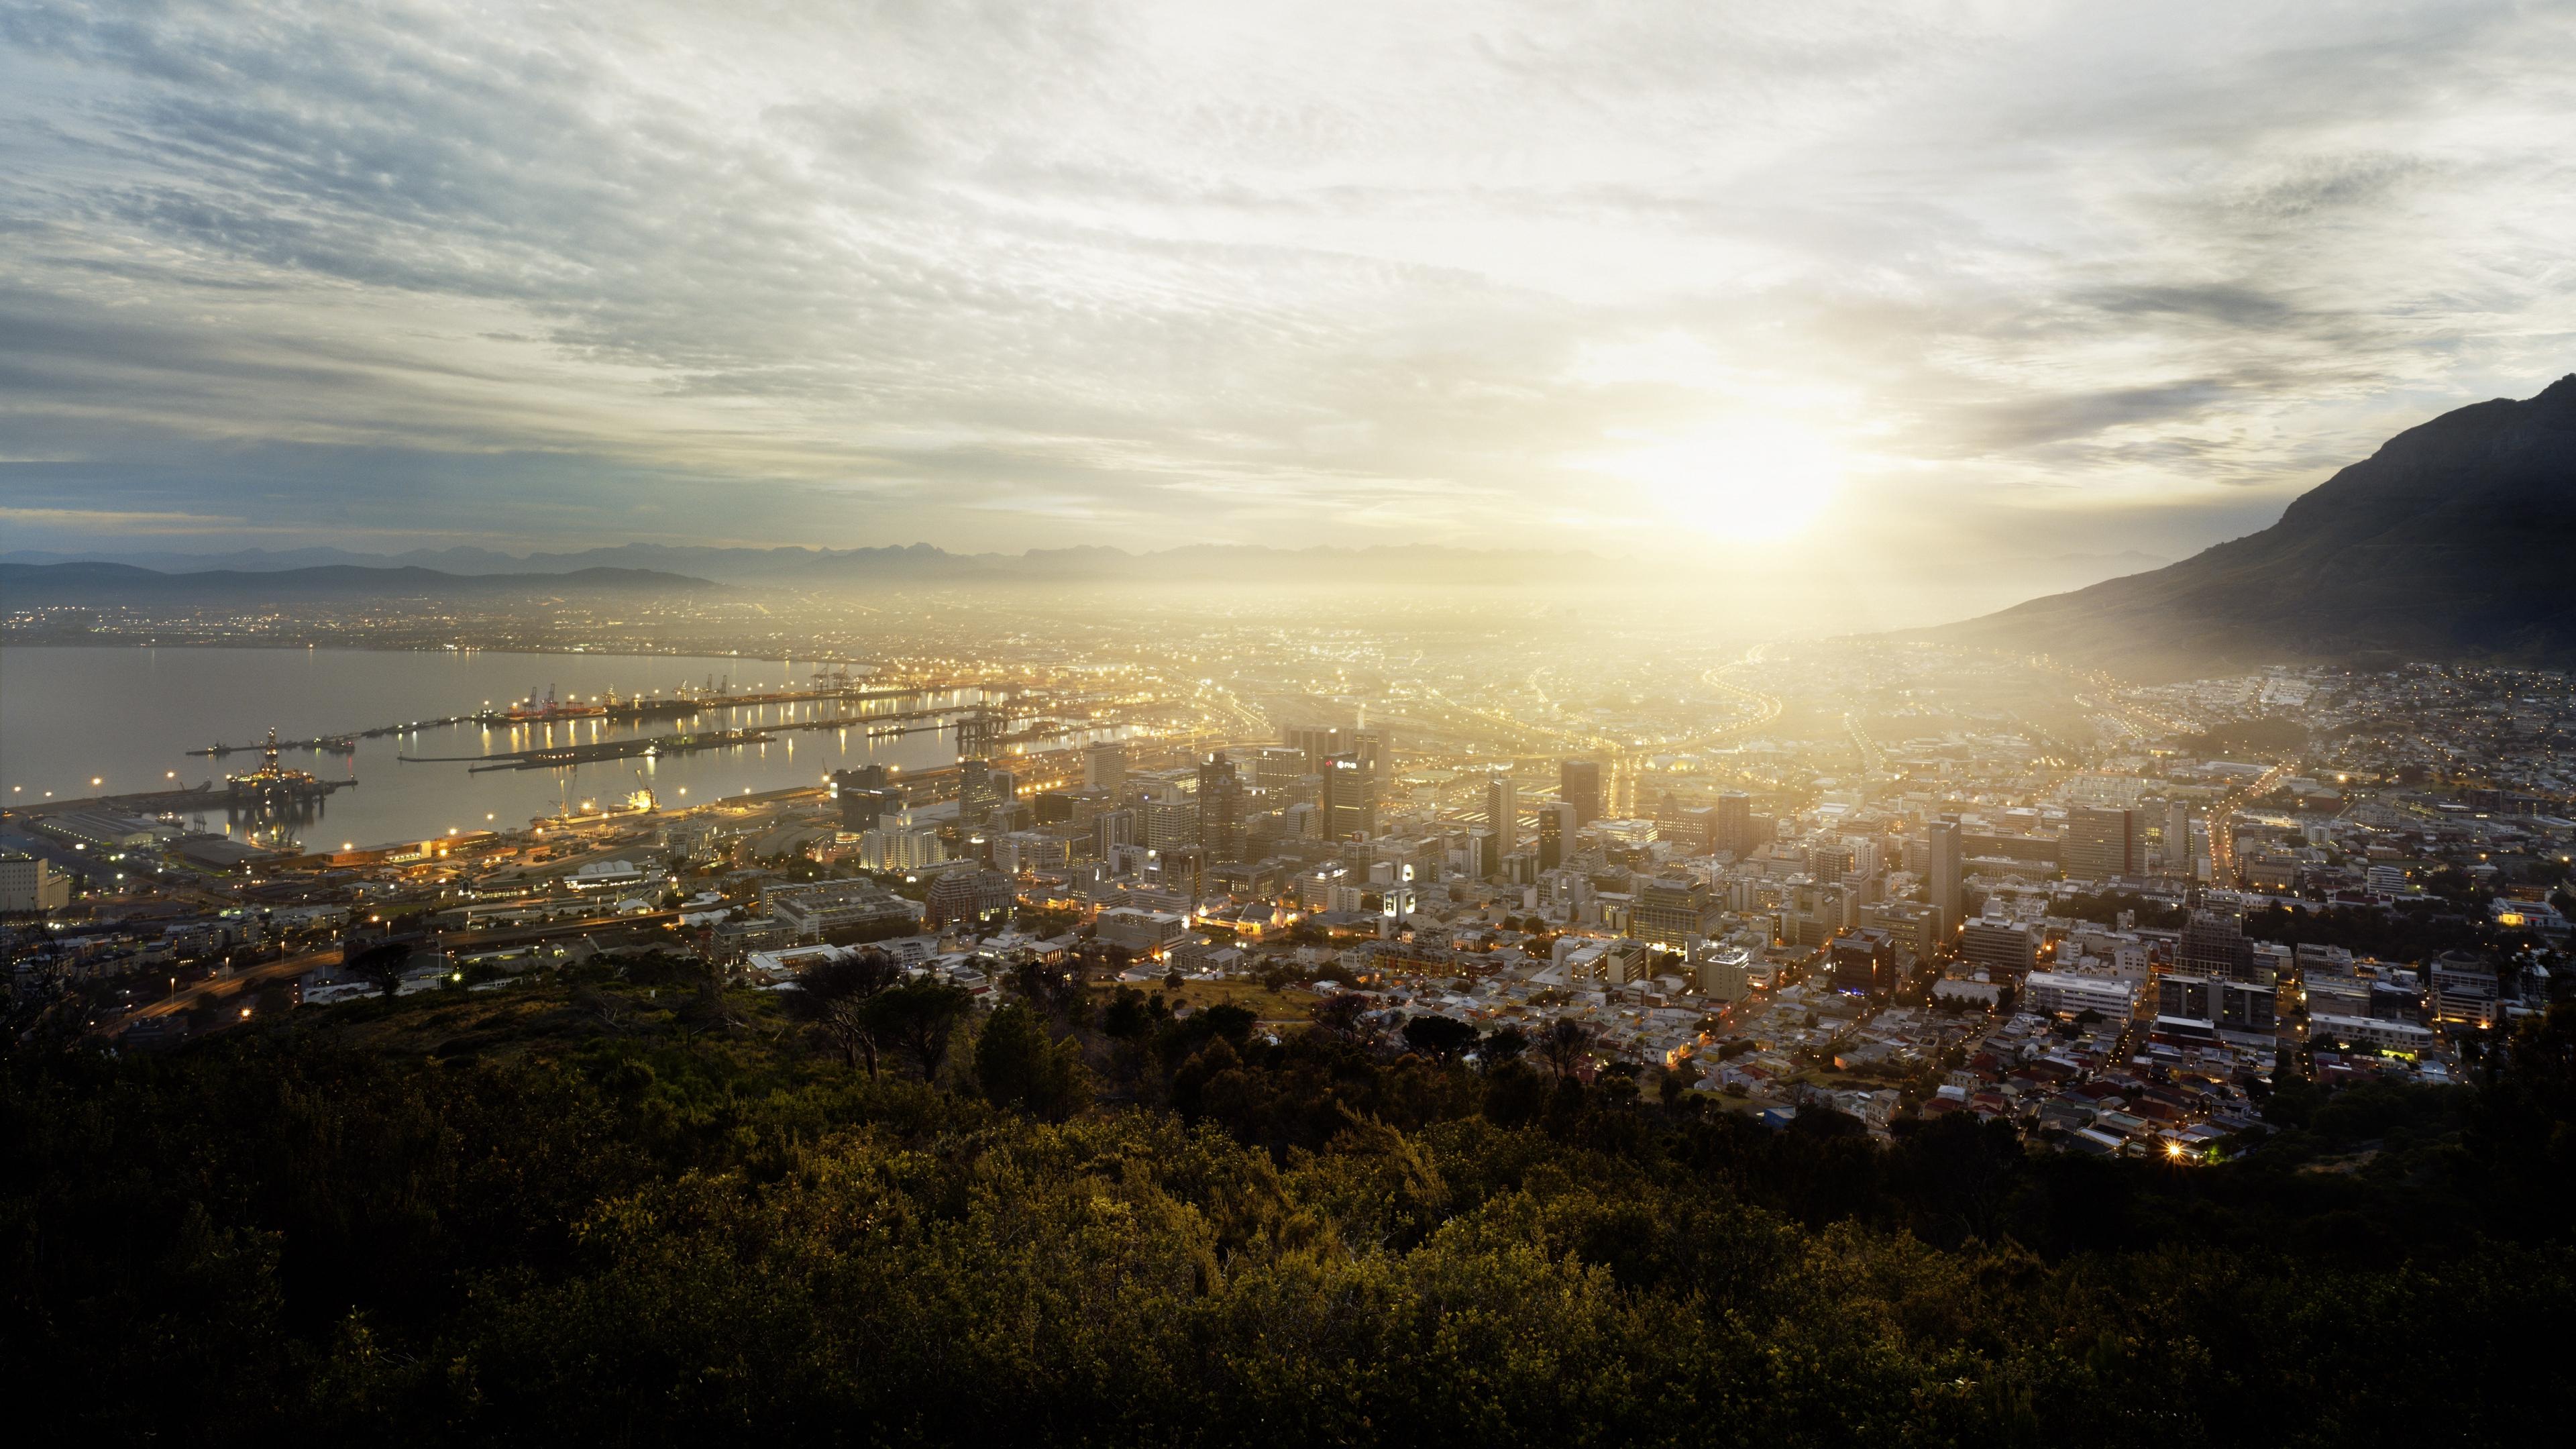 Wallpaper 4k Cape Town South Africa Fog Buildings Hills